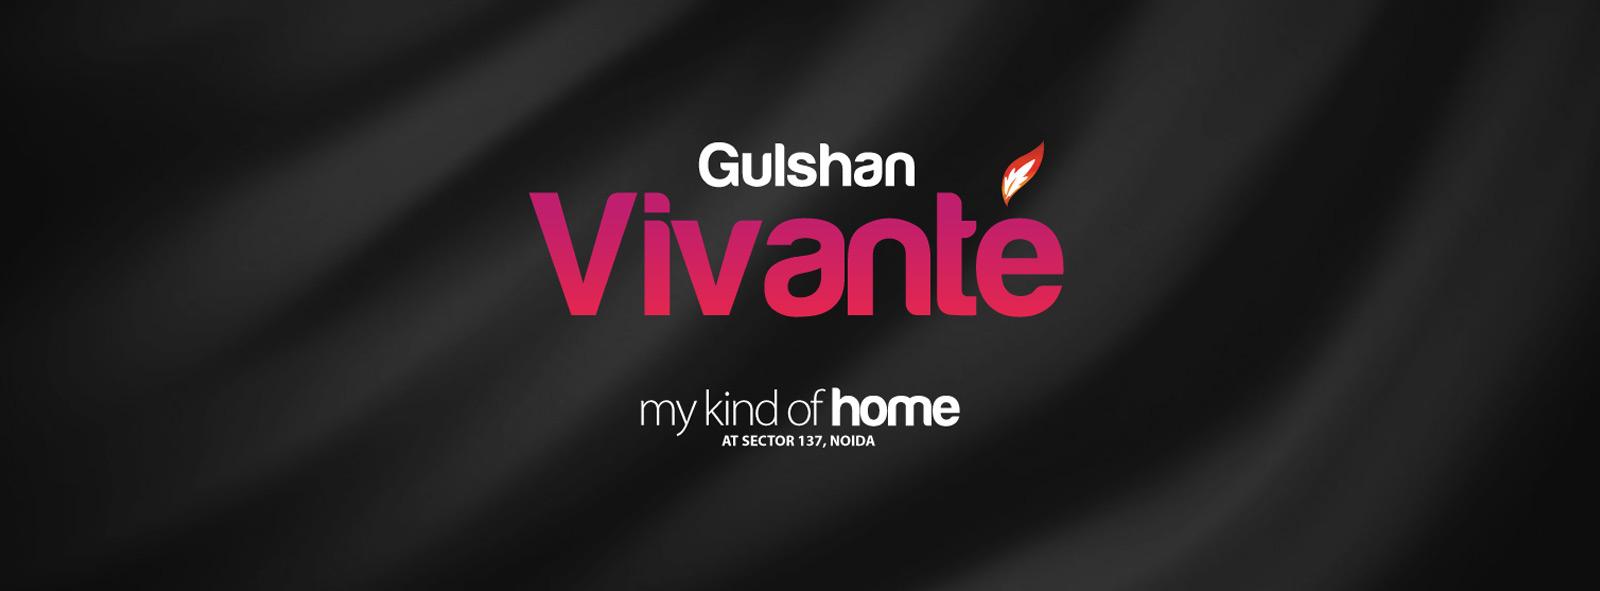 Gulshan Vivante